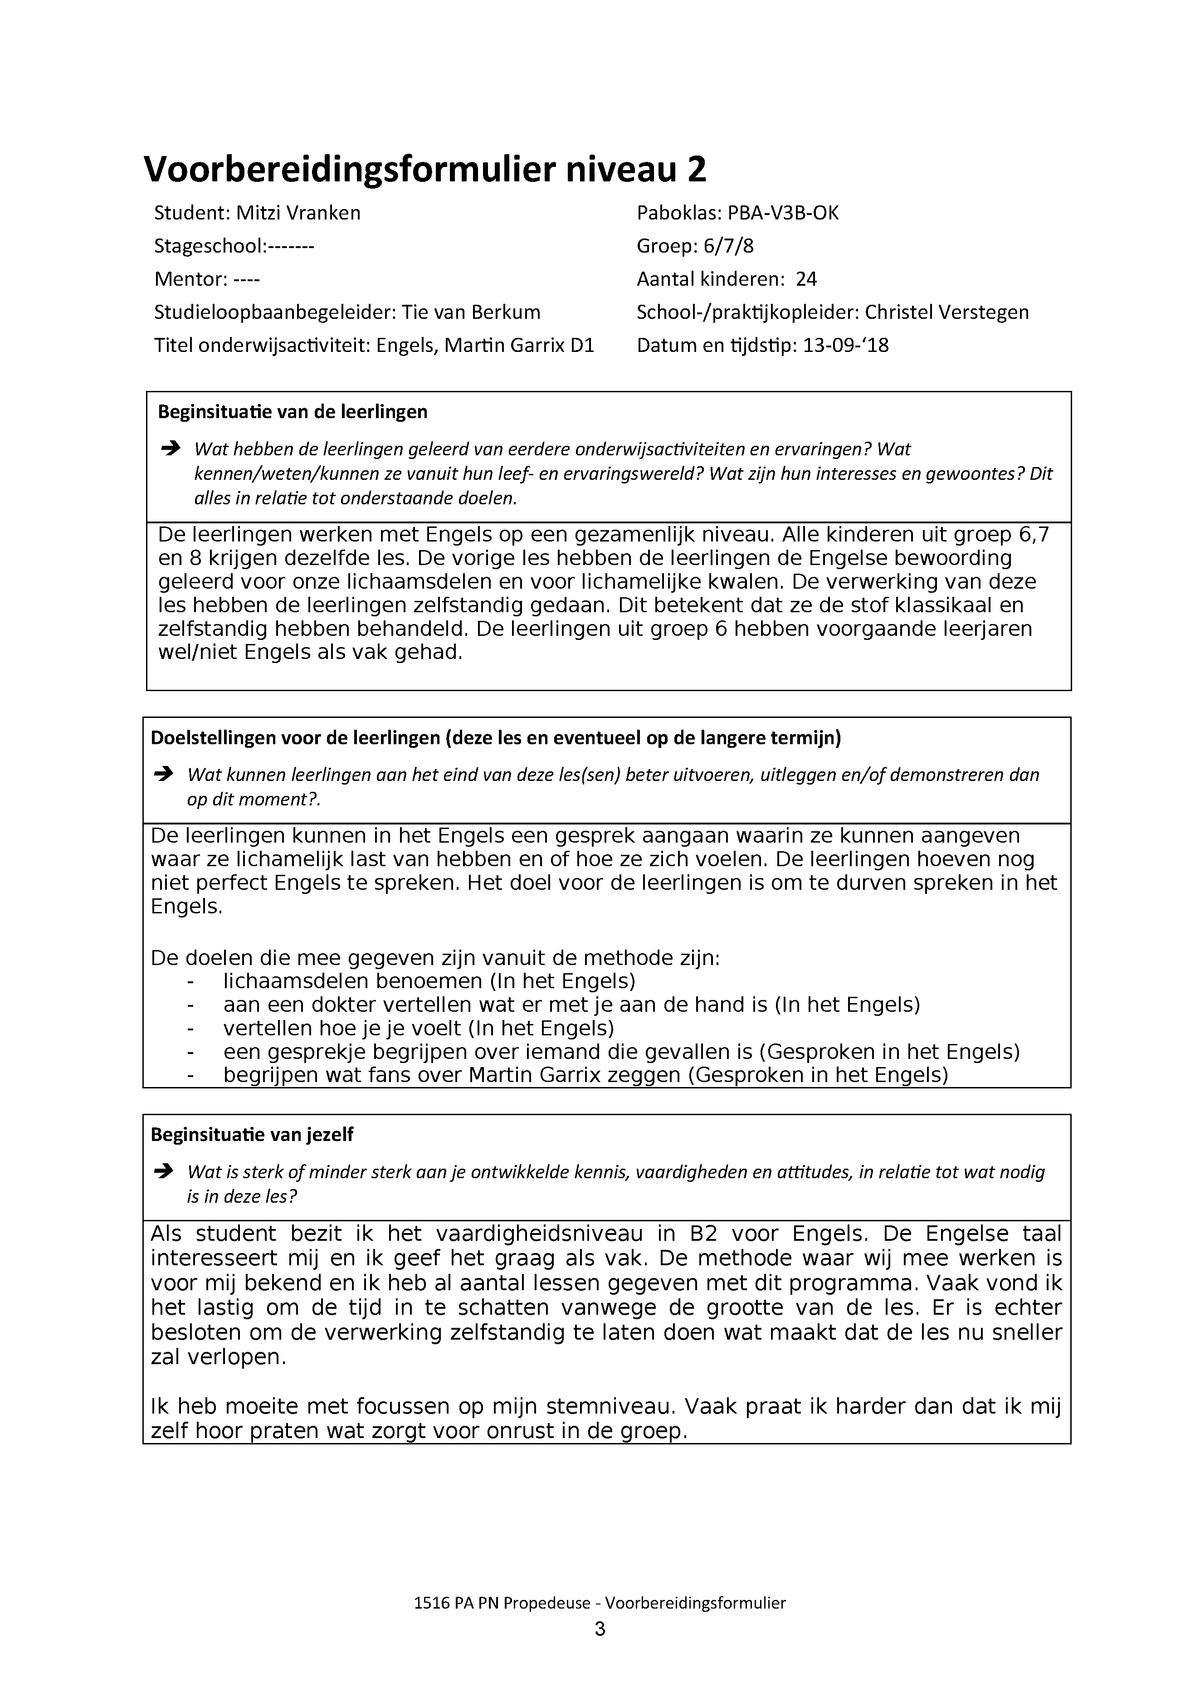 Fonkelnieuw Lesvoorbereidingsformulier Engels 13-09 - APA-ENG1A - StudeerSnel RT-24